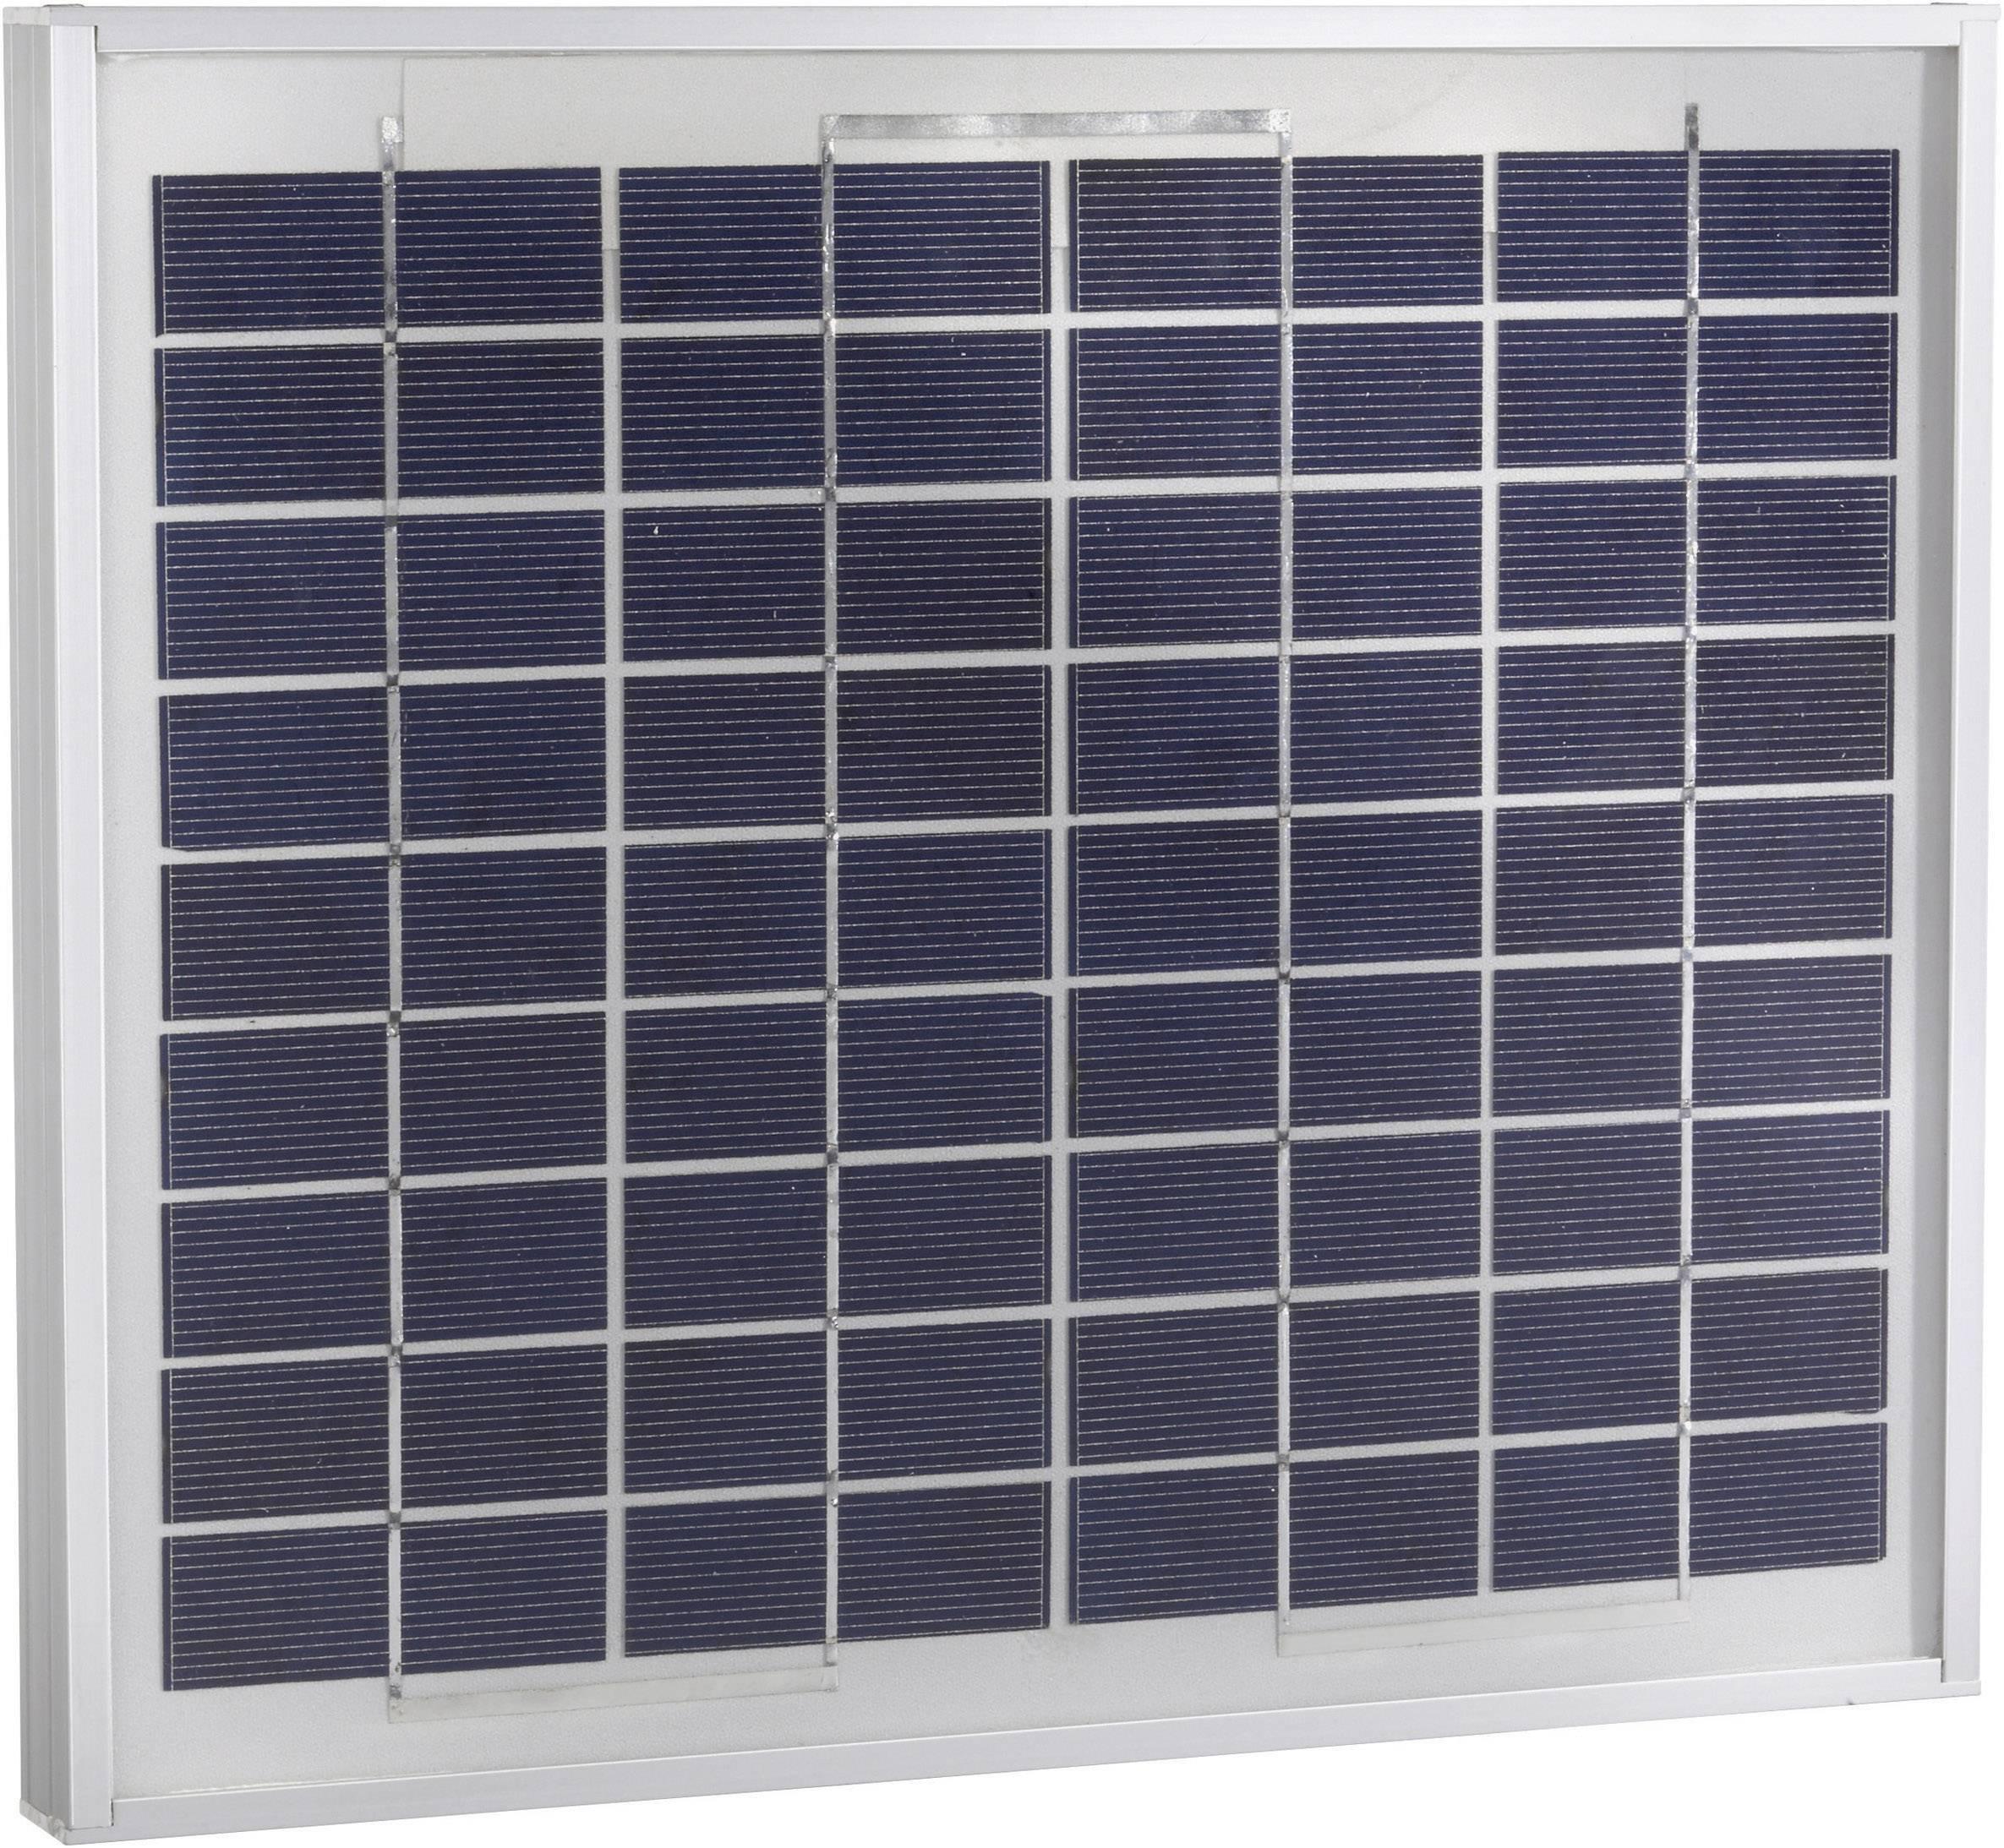 Solární moduly